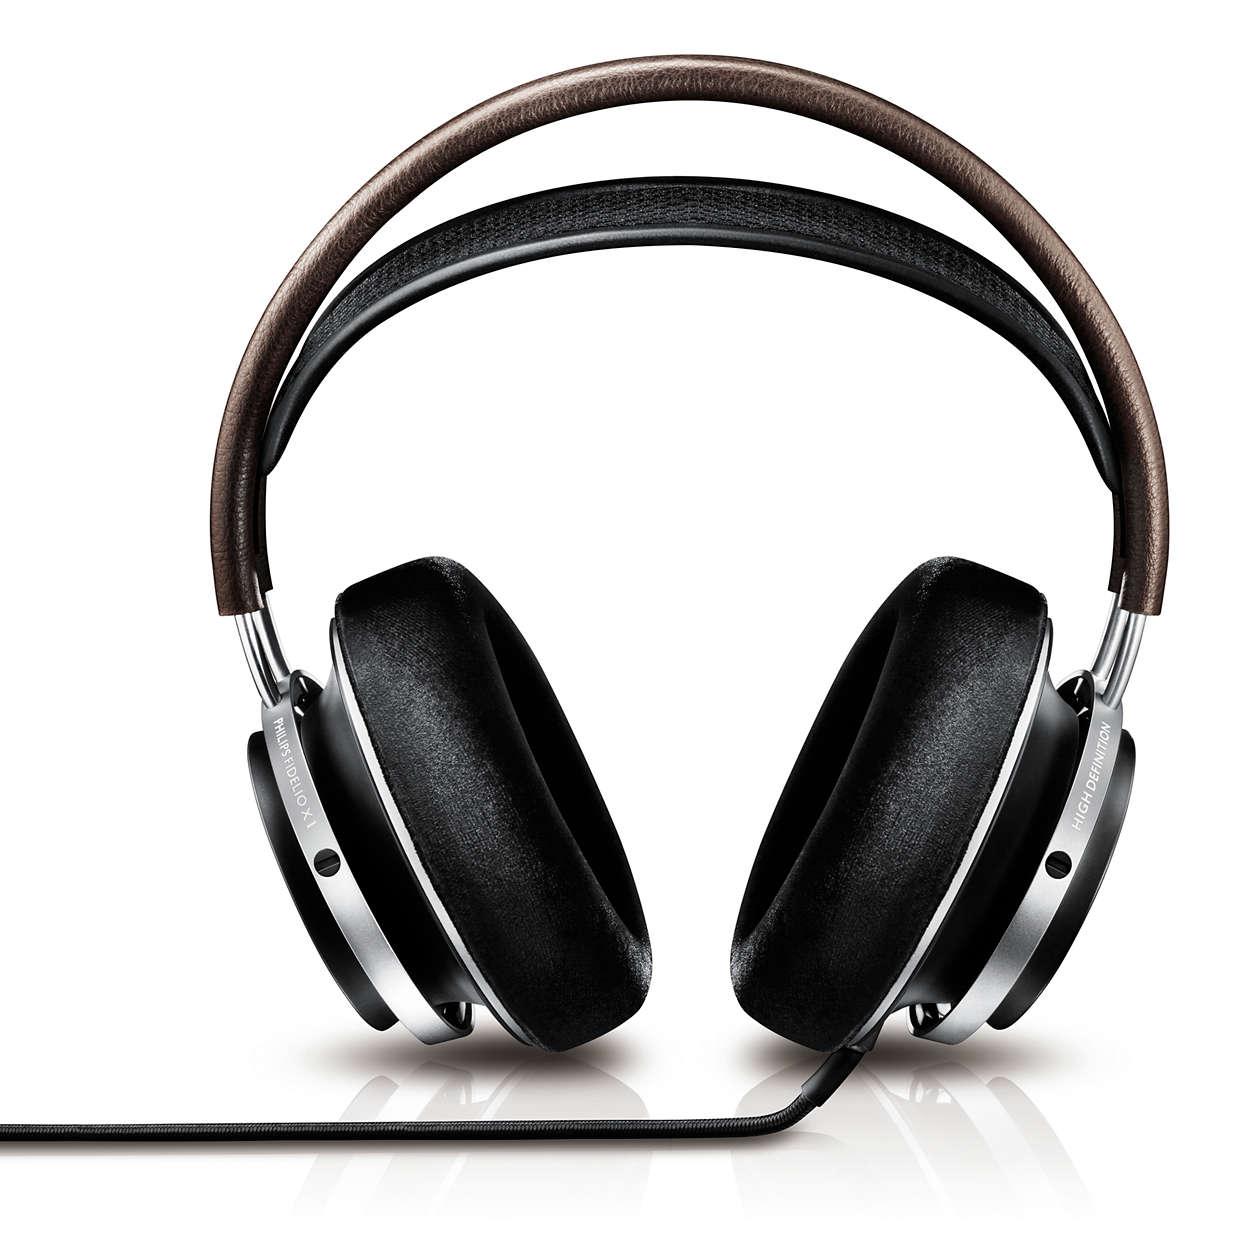 Audio ad alta fedeltà, qualità superiore